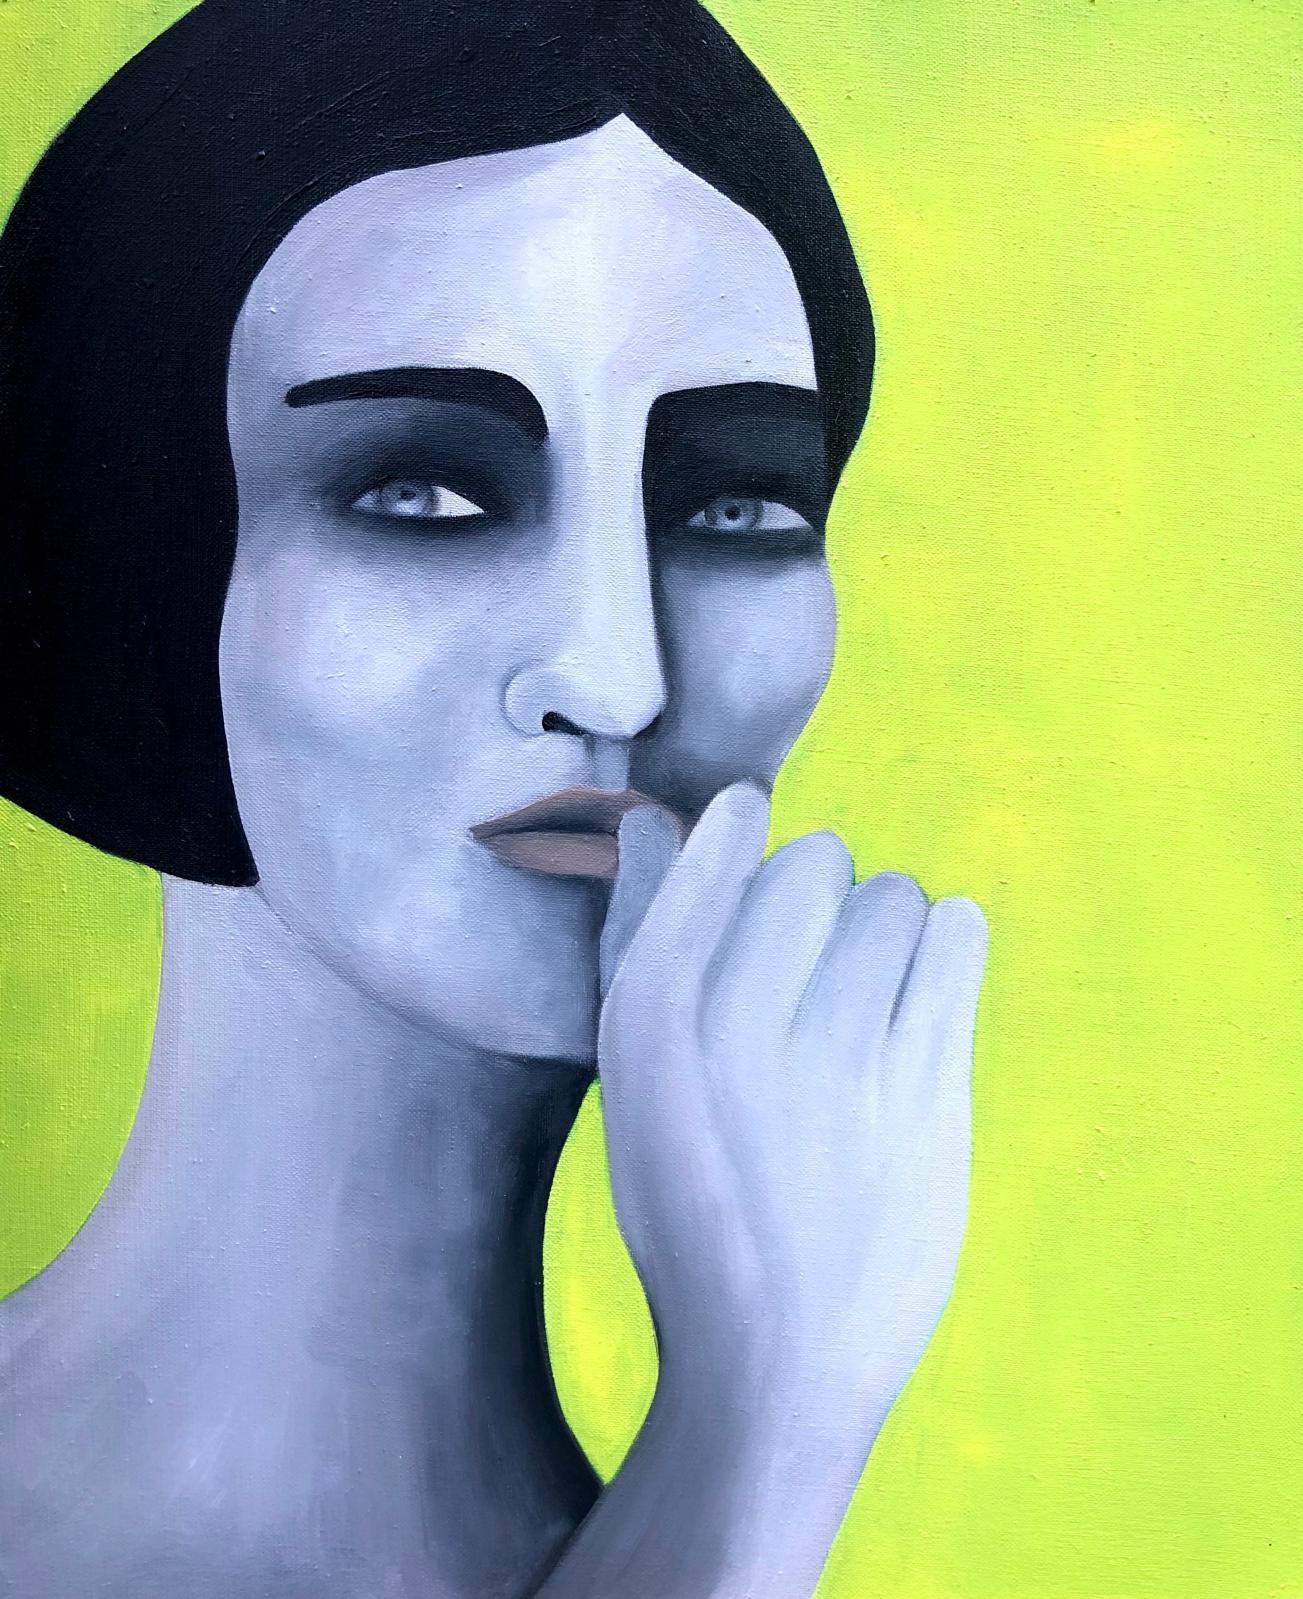 Rebecca Brodski (née n 1988), Midnight Interrogation, 2021, huile sur toile, 61x50cm. © courtesy BY LARA SEDBON